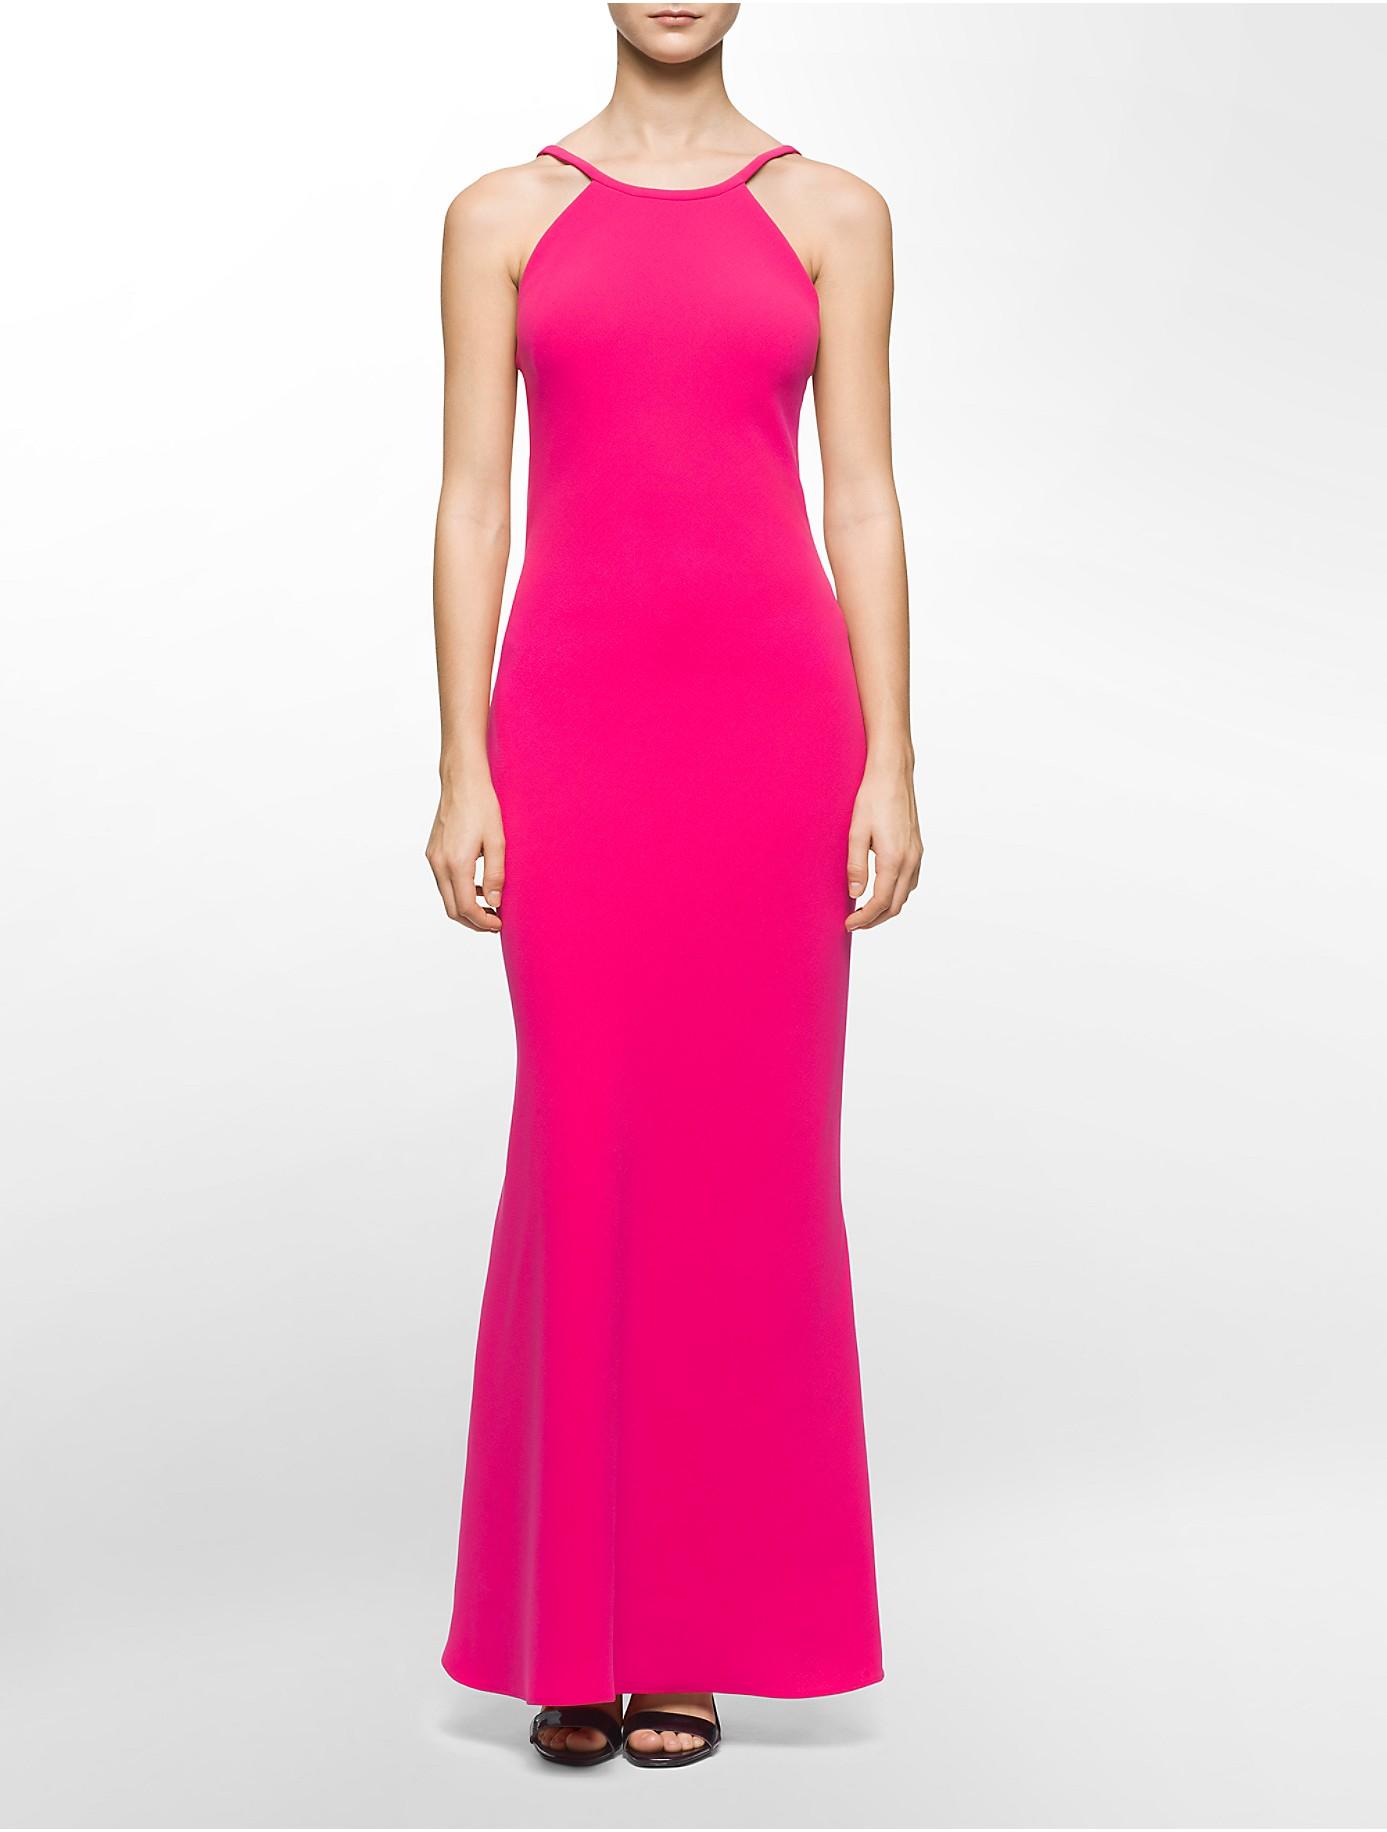 Lyst Calvin Klein White Label Halter Neck Low Back Gown In Pink